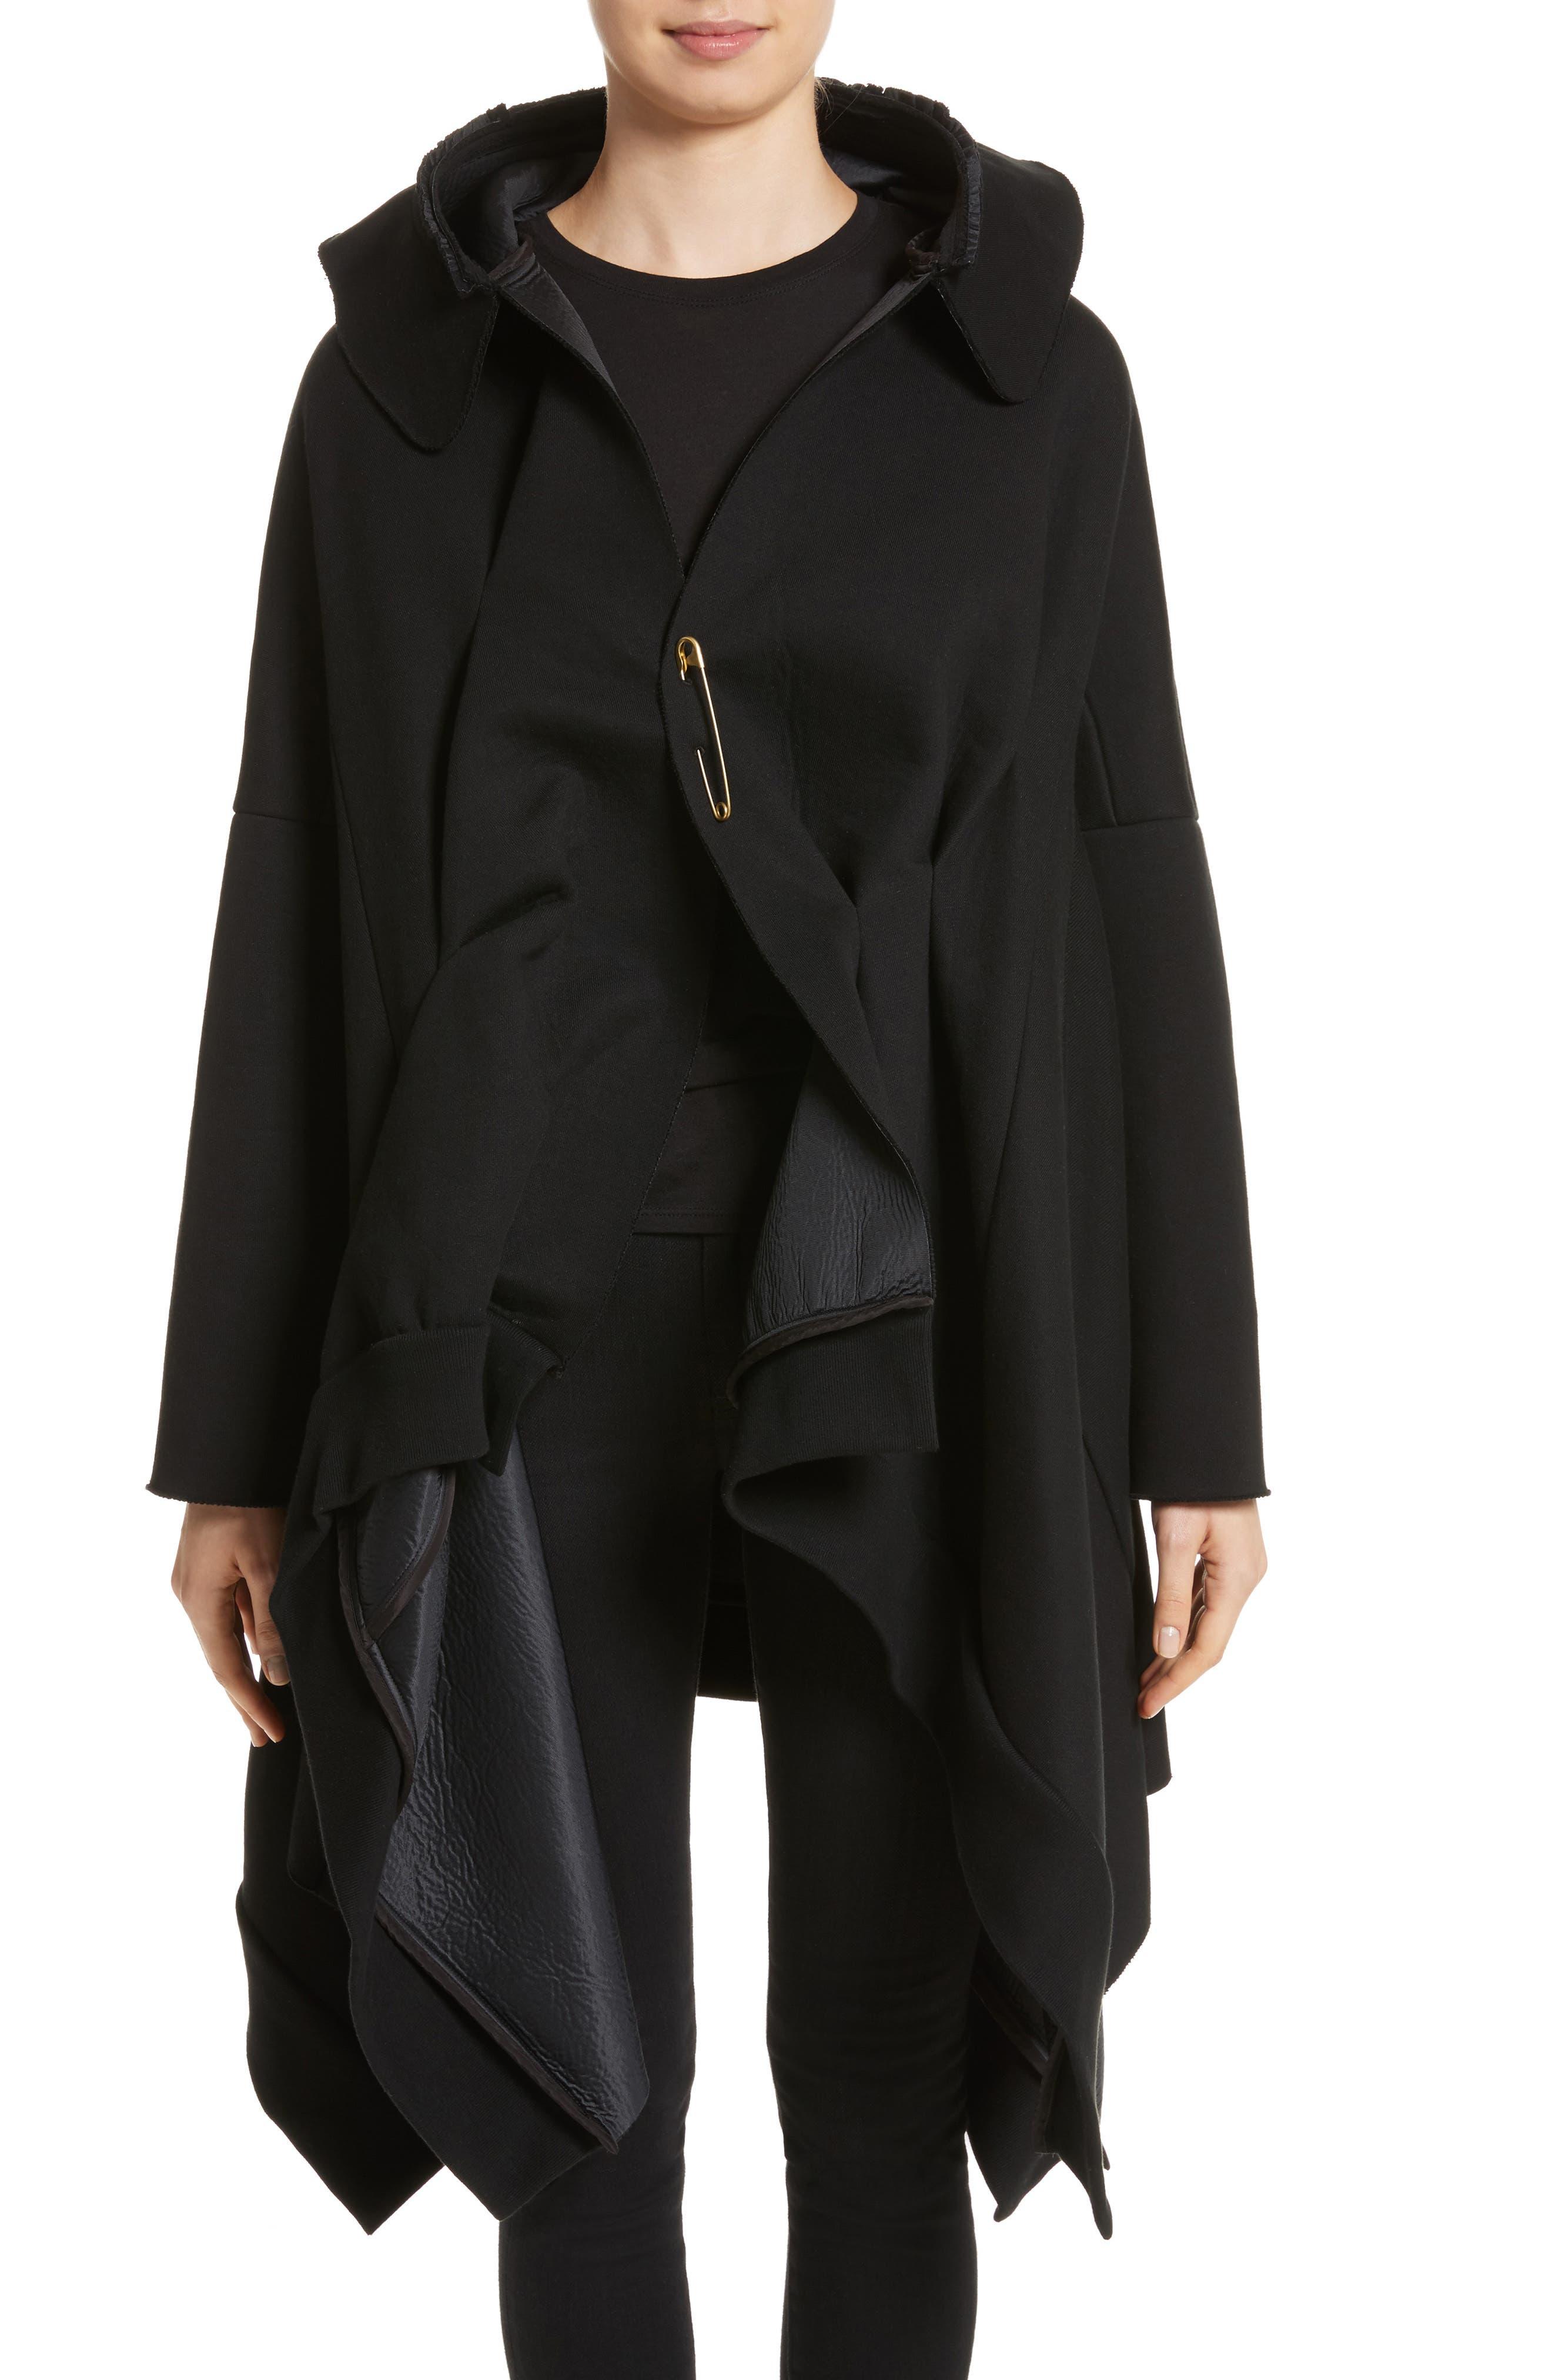 Undercover Hooded Coat